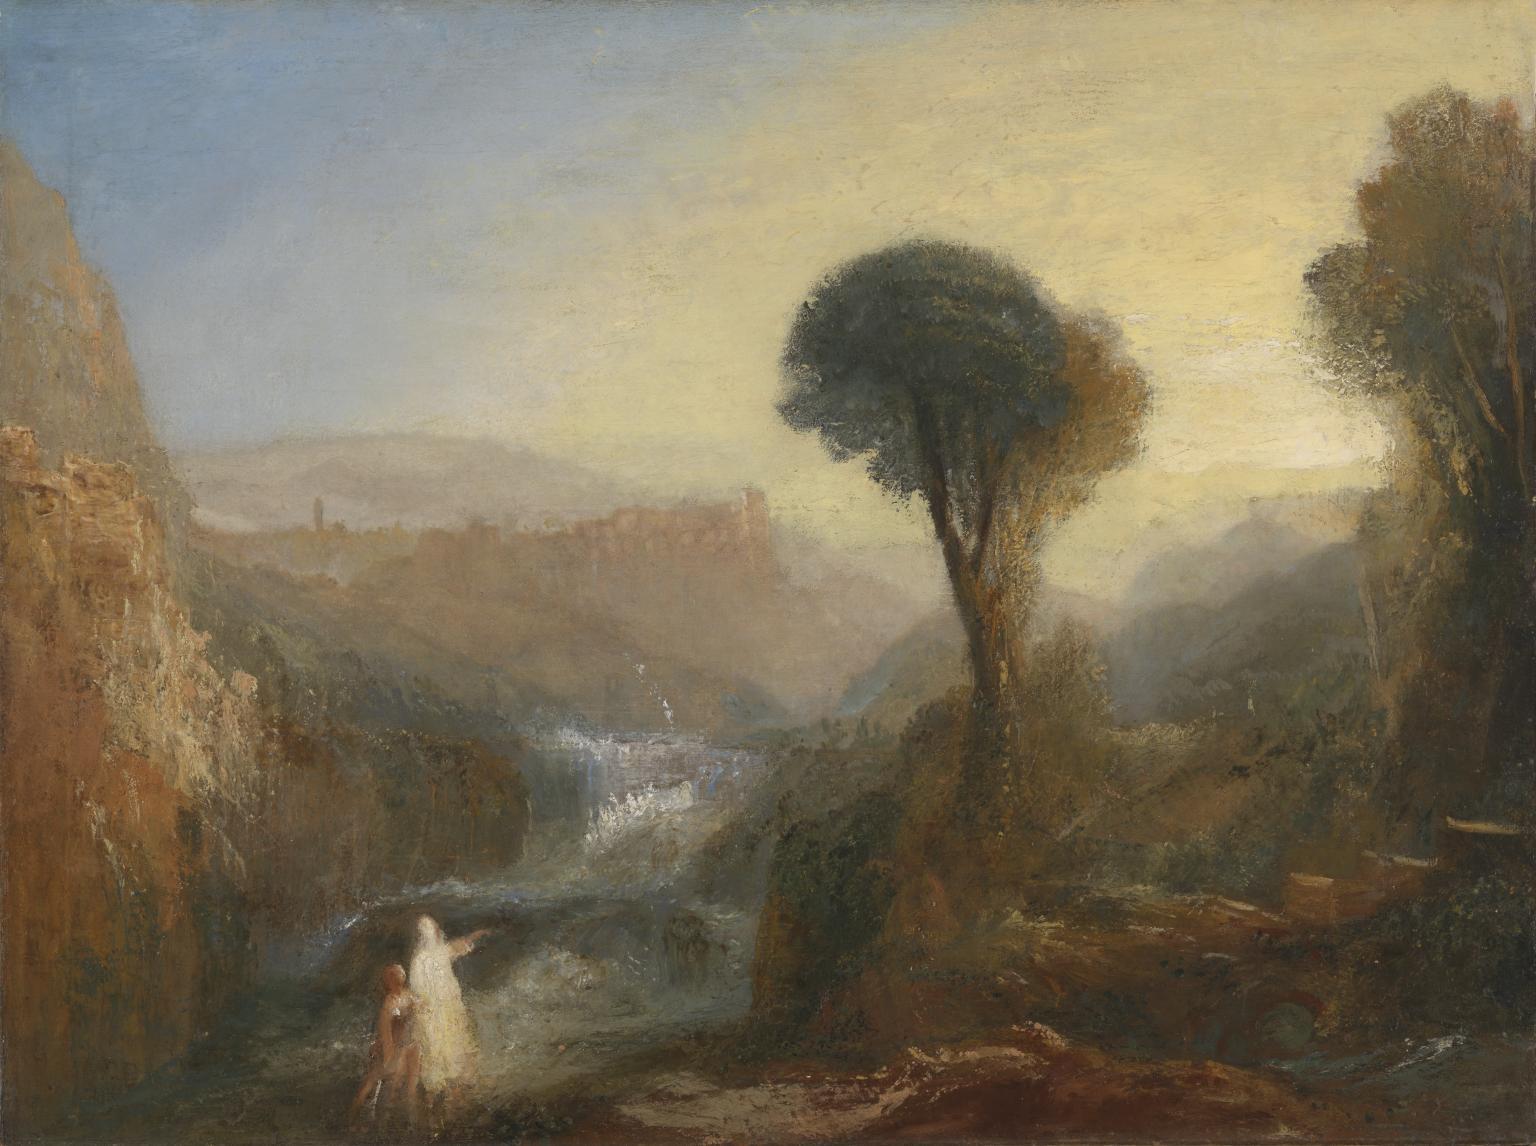 Tivoli: Tobias and the Angel c.1835 by Joseph Mallord William Turner 1775-1851